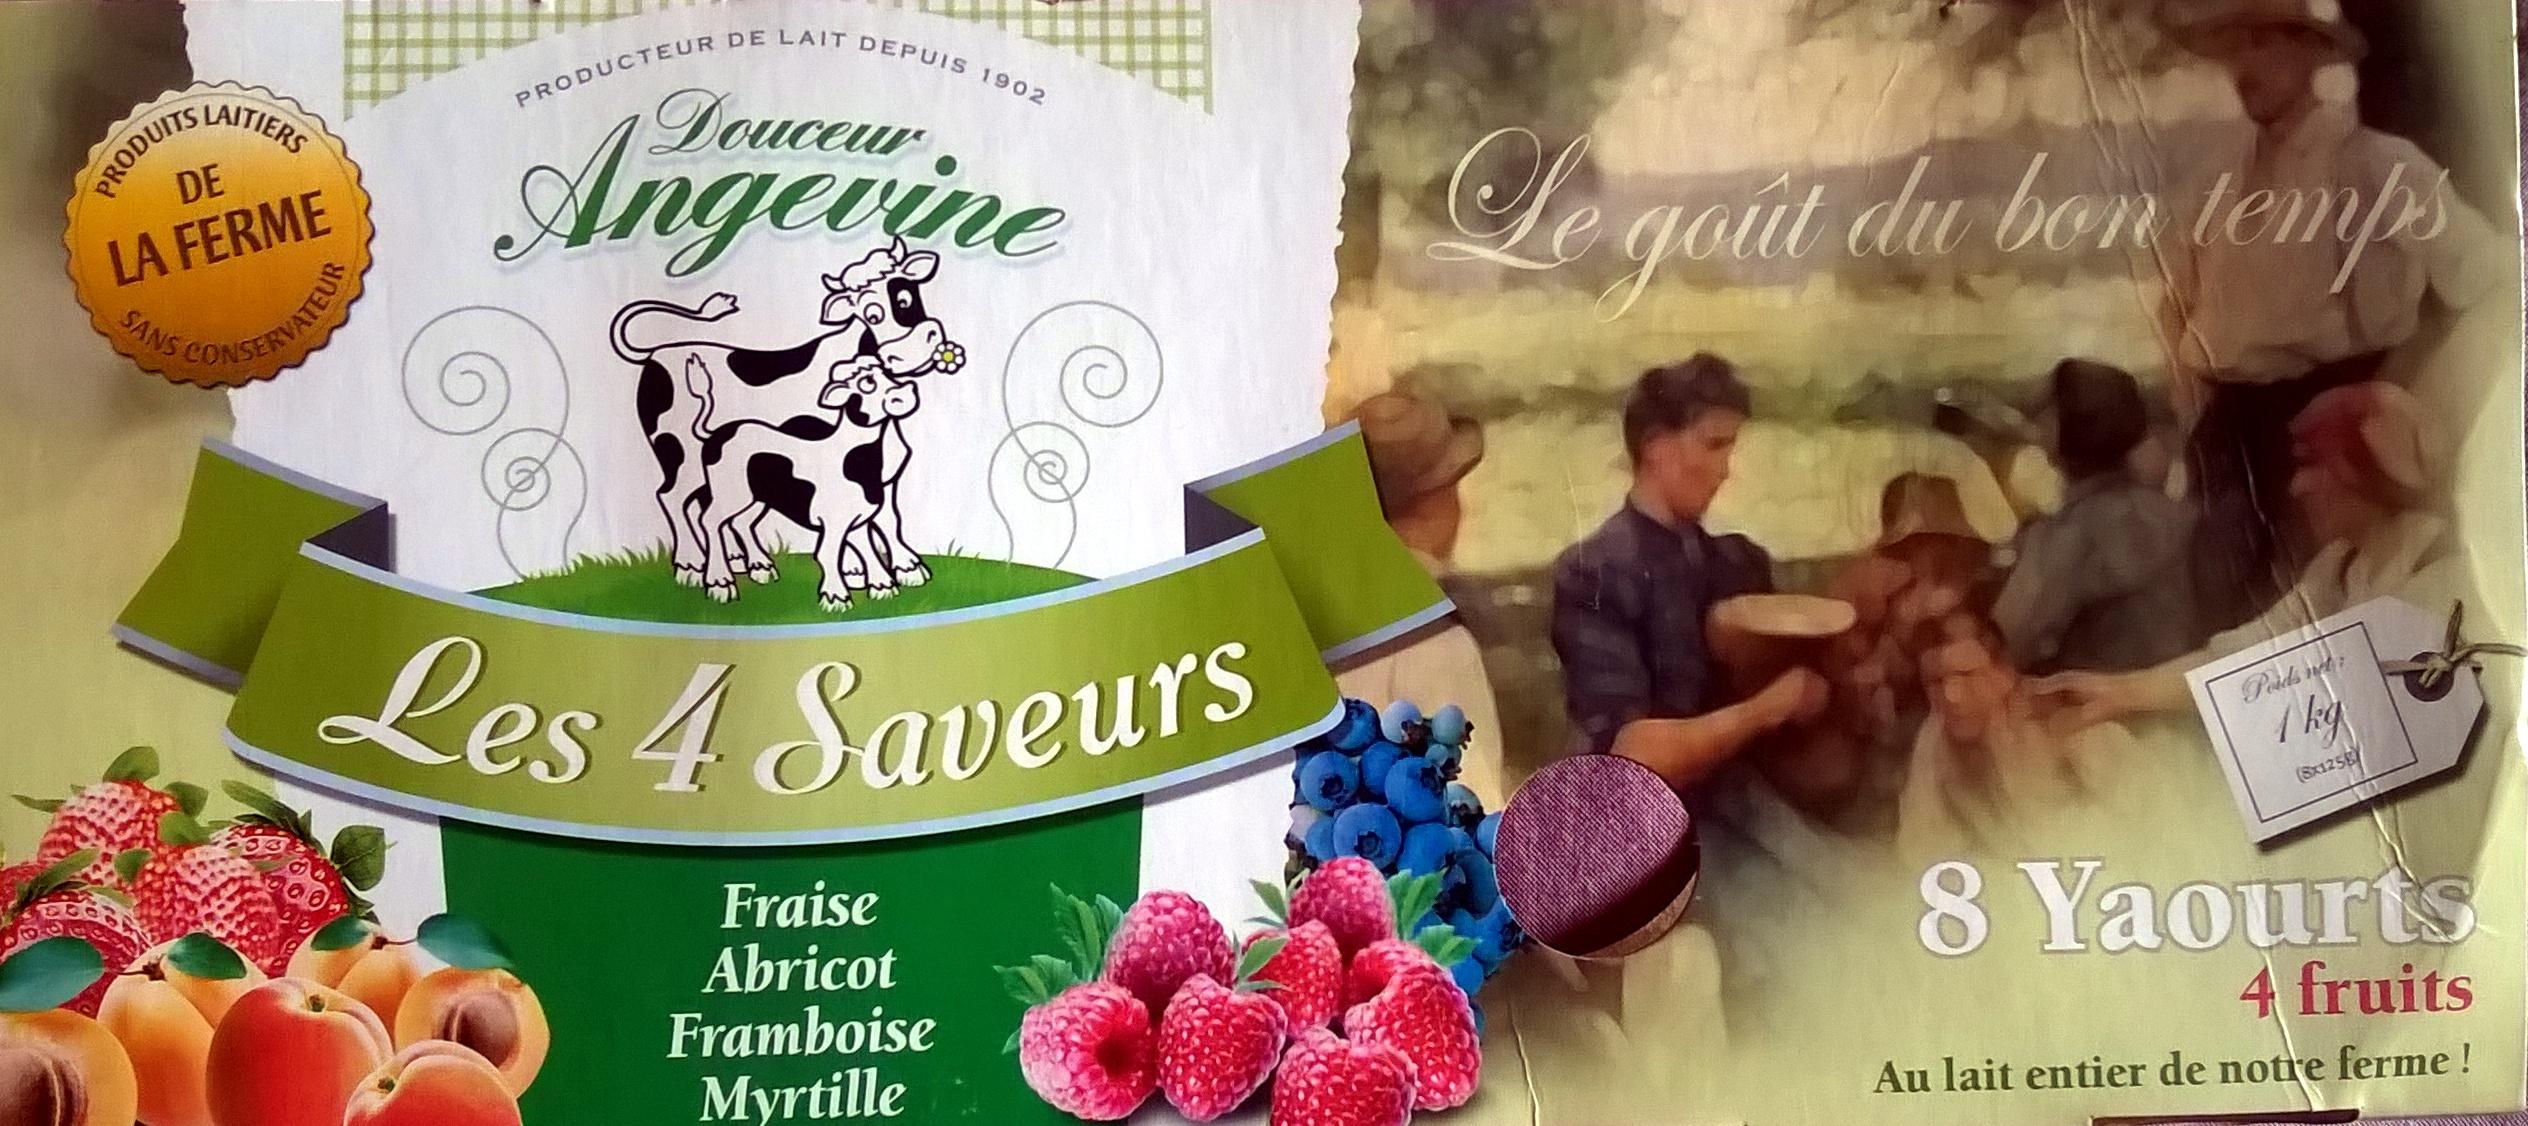 8 yaourts 4 fruits - Produit - fr